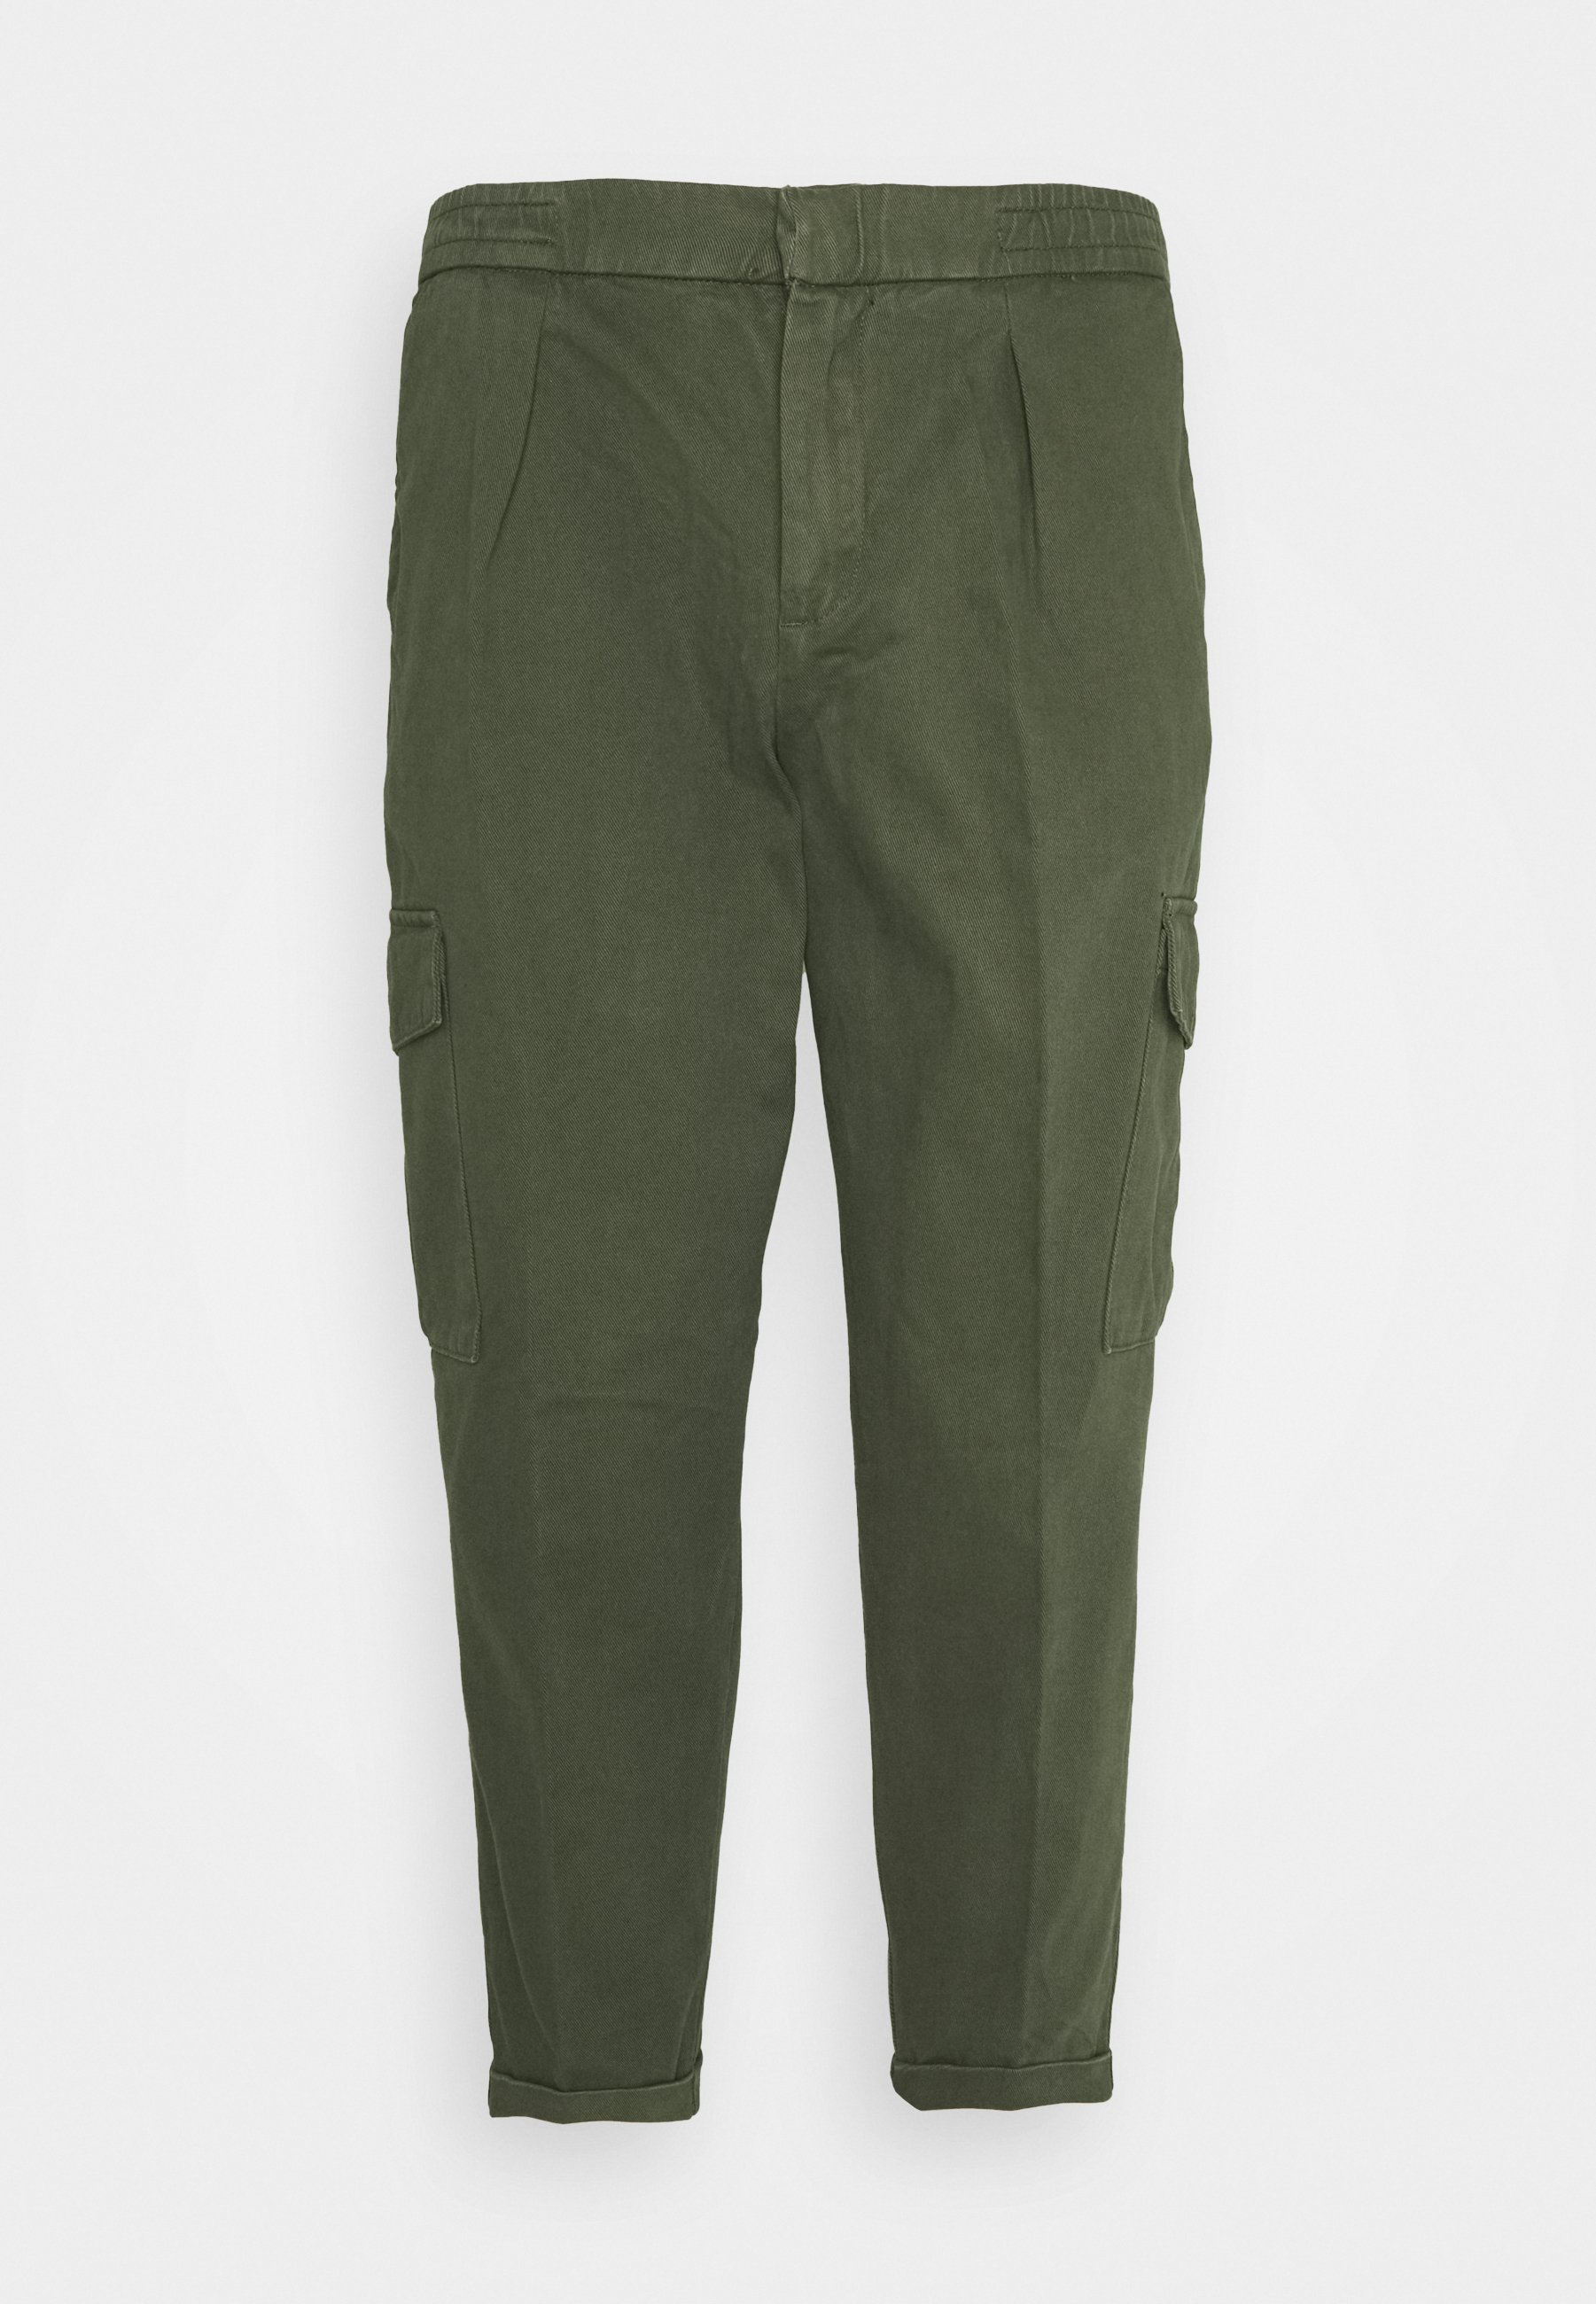 Homme USJASPER CARGO PANTS - Pantalon cargo